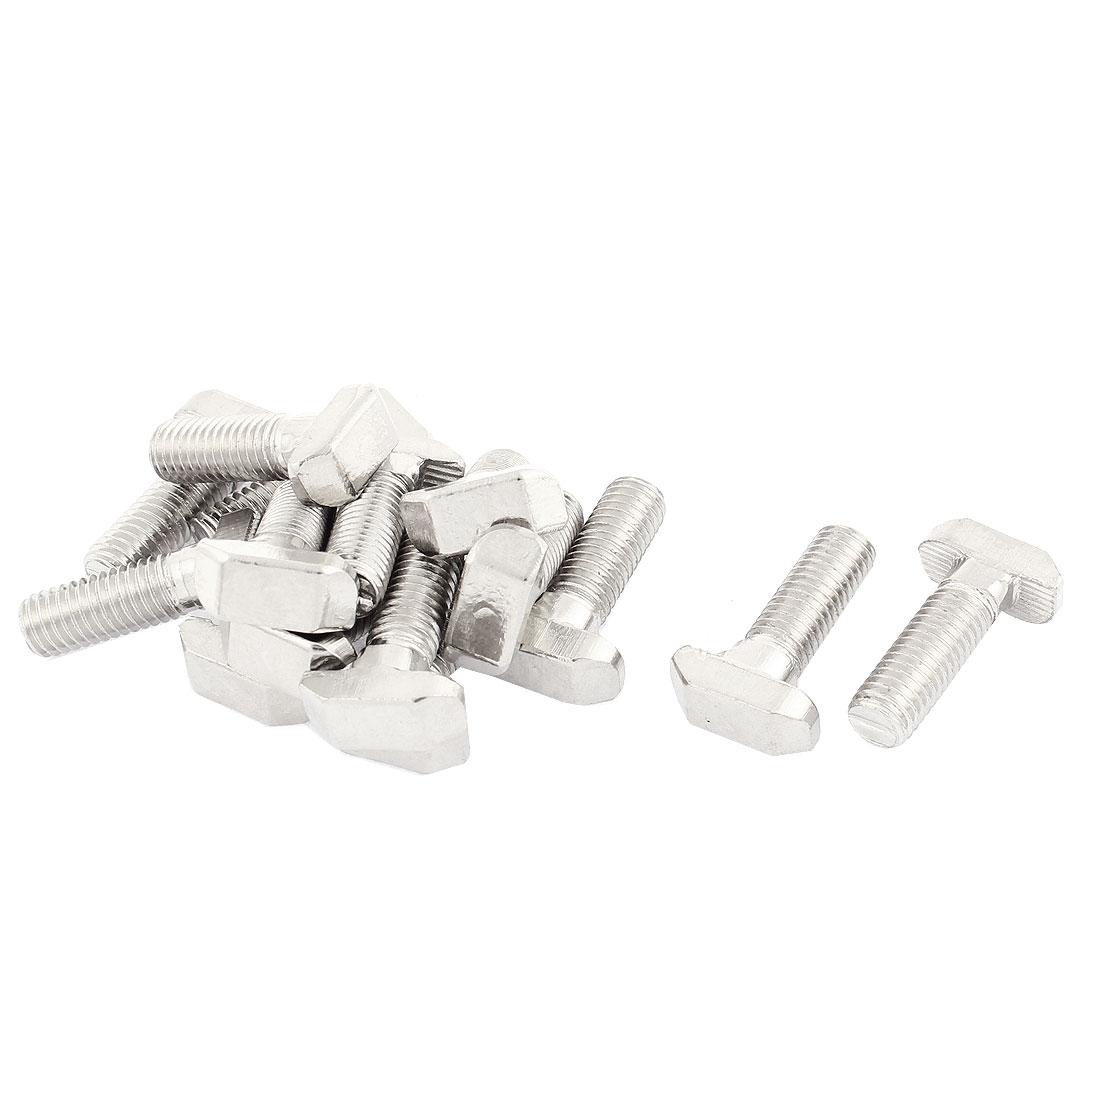 M8 Thread Metal T-Slot Drop-In Stud Sliding Screw Bolt Silver Tone 15pcs